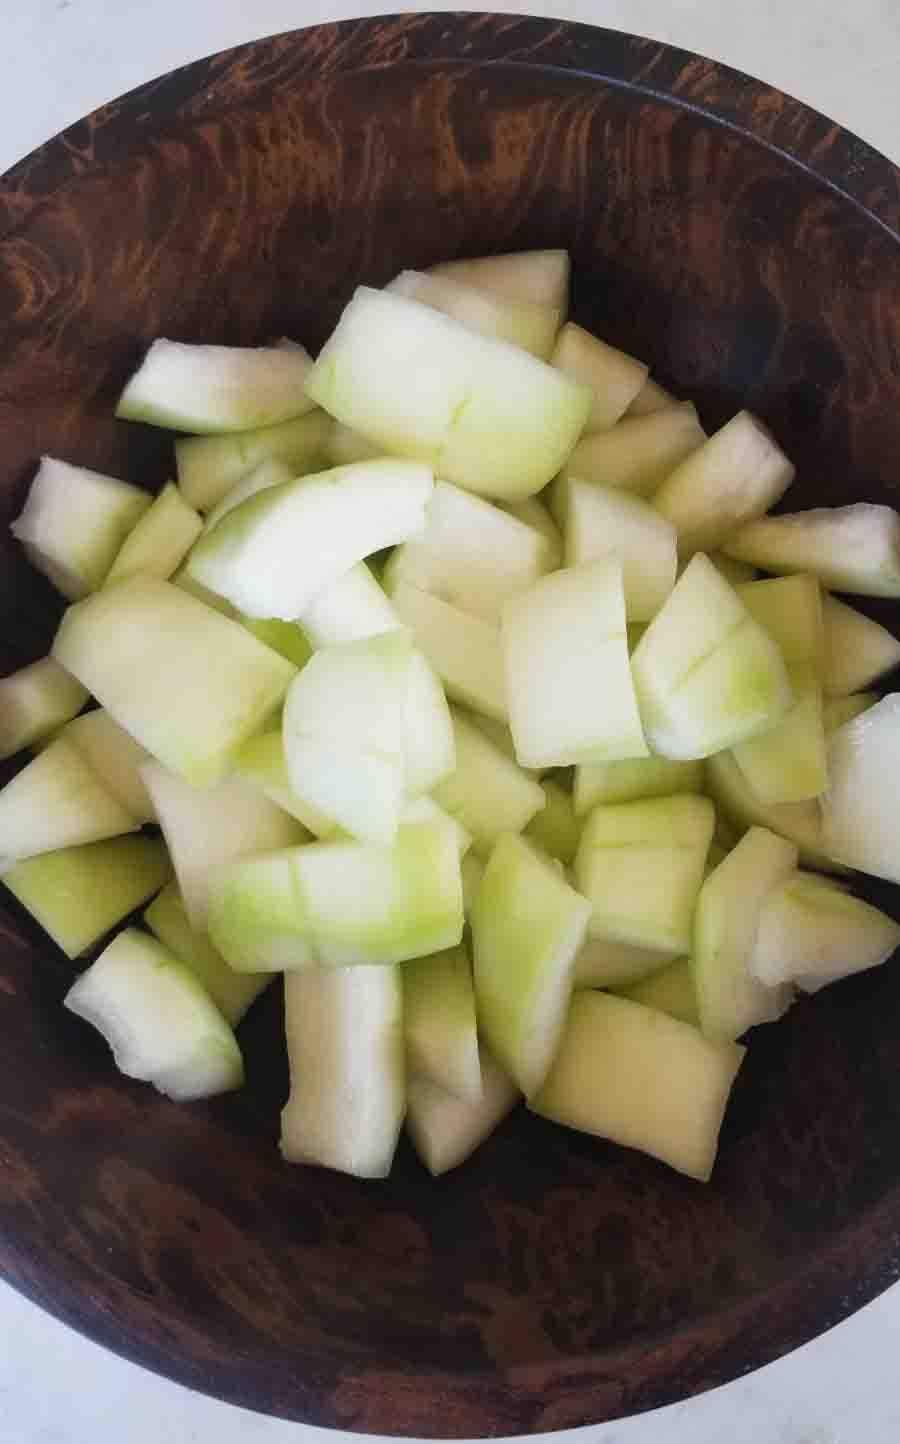 Winter Melon cut into cubes